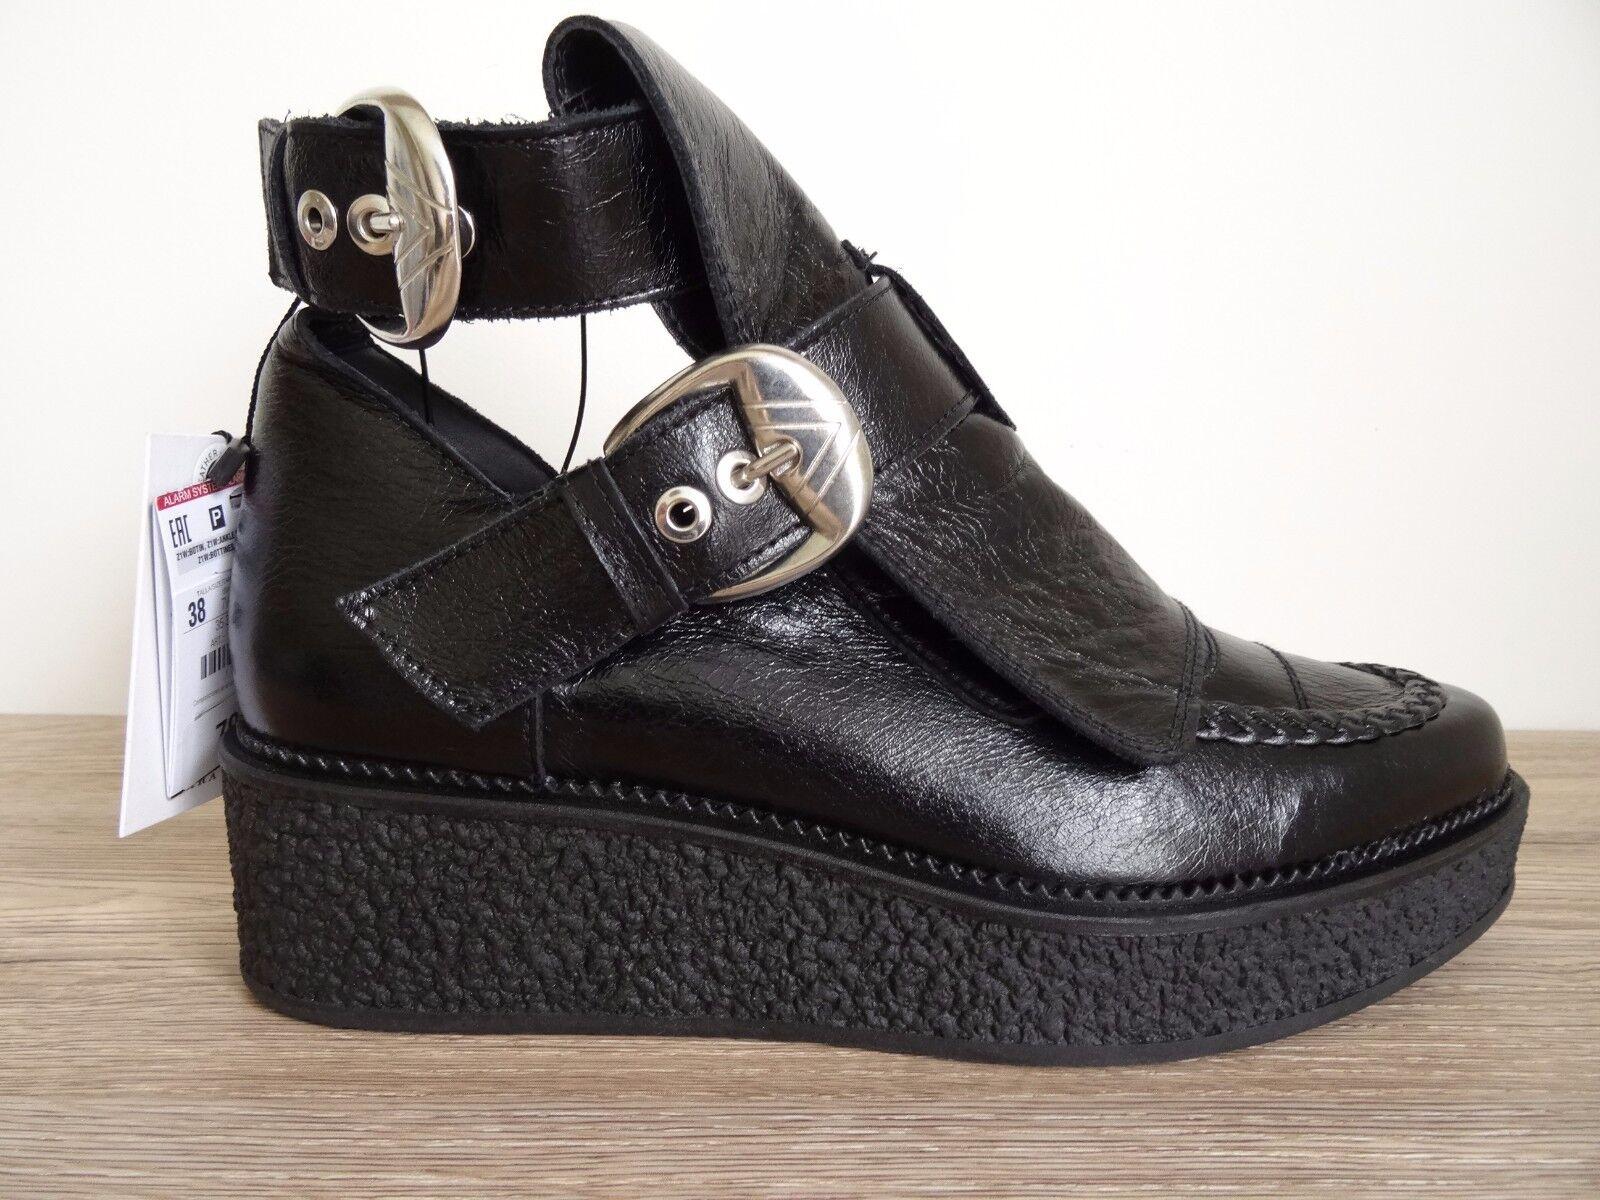 ZARA BLACK LEATHER FLAT ANKLE BOOTS WITH BUCKLES SIZE UK UK UK 2 (3) EU 35 (36) 616de7